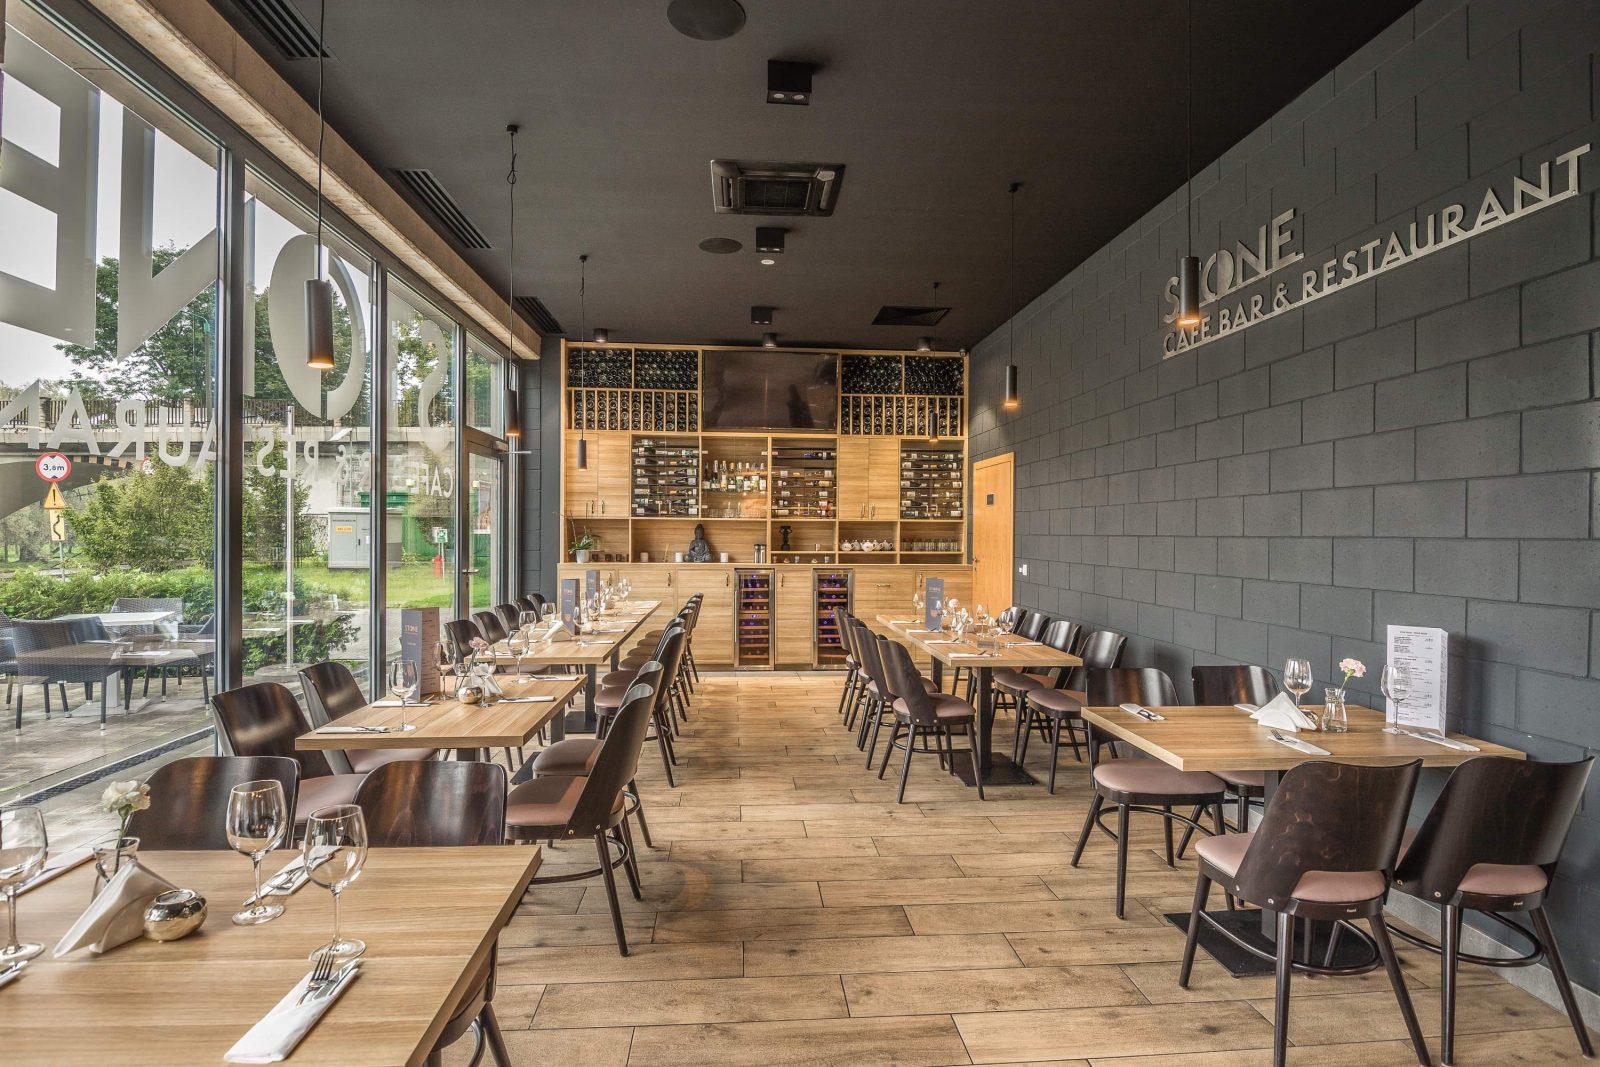 Stone Cafe Bar & Restaurant